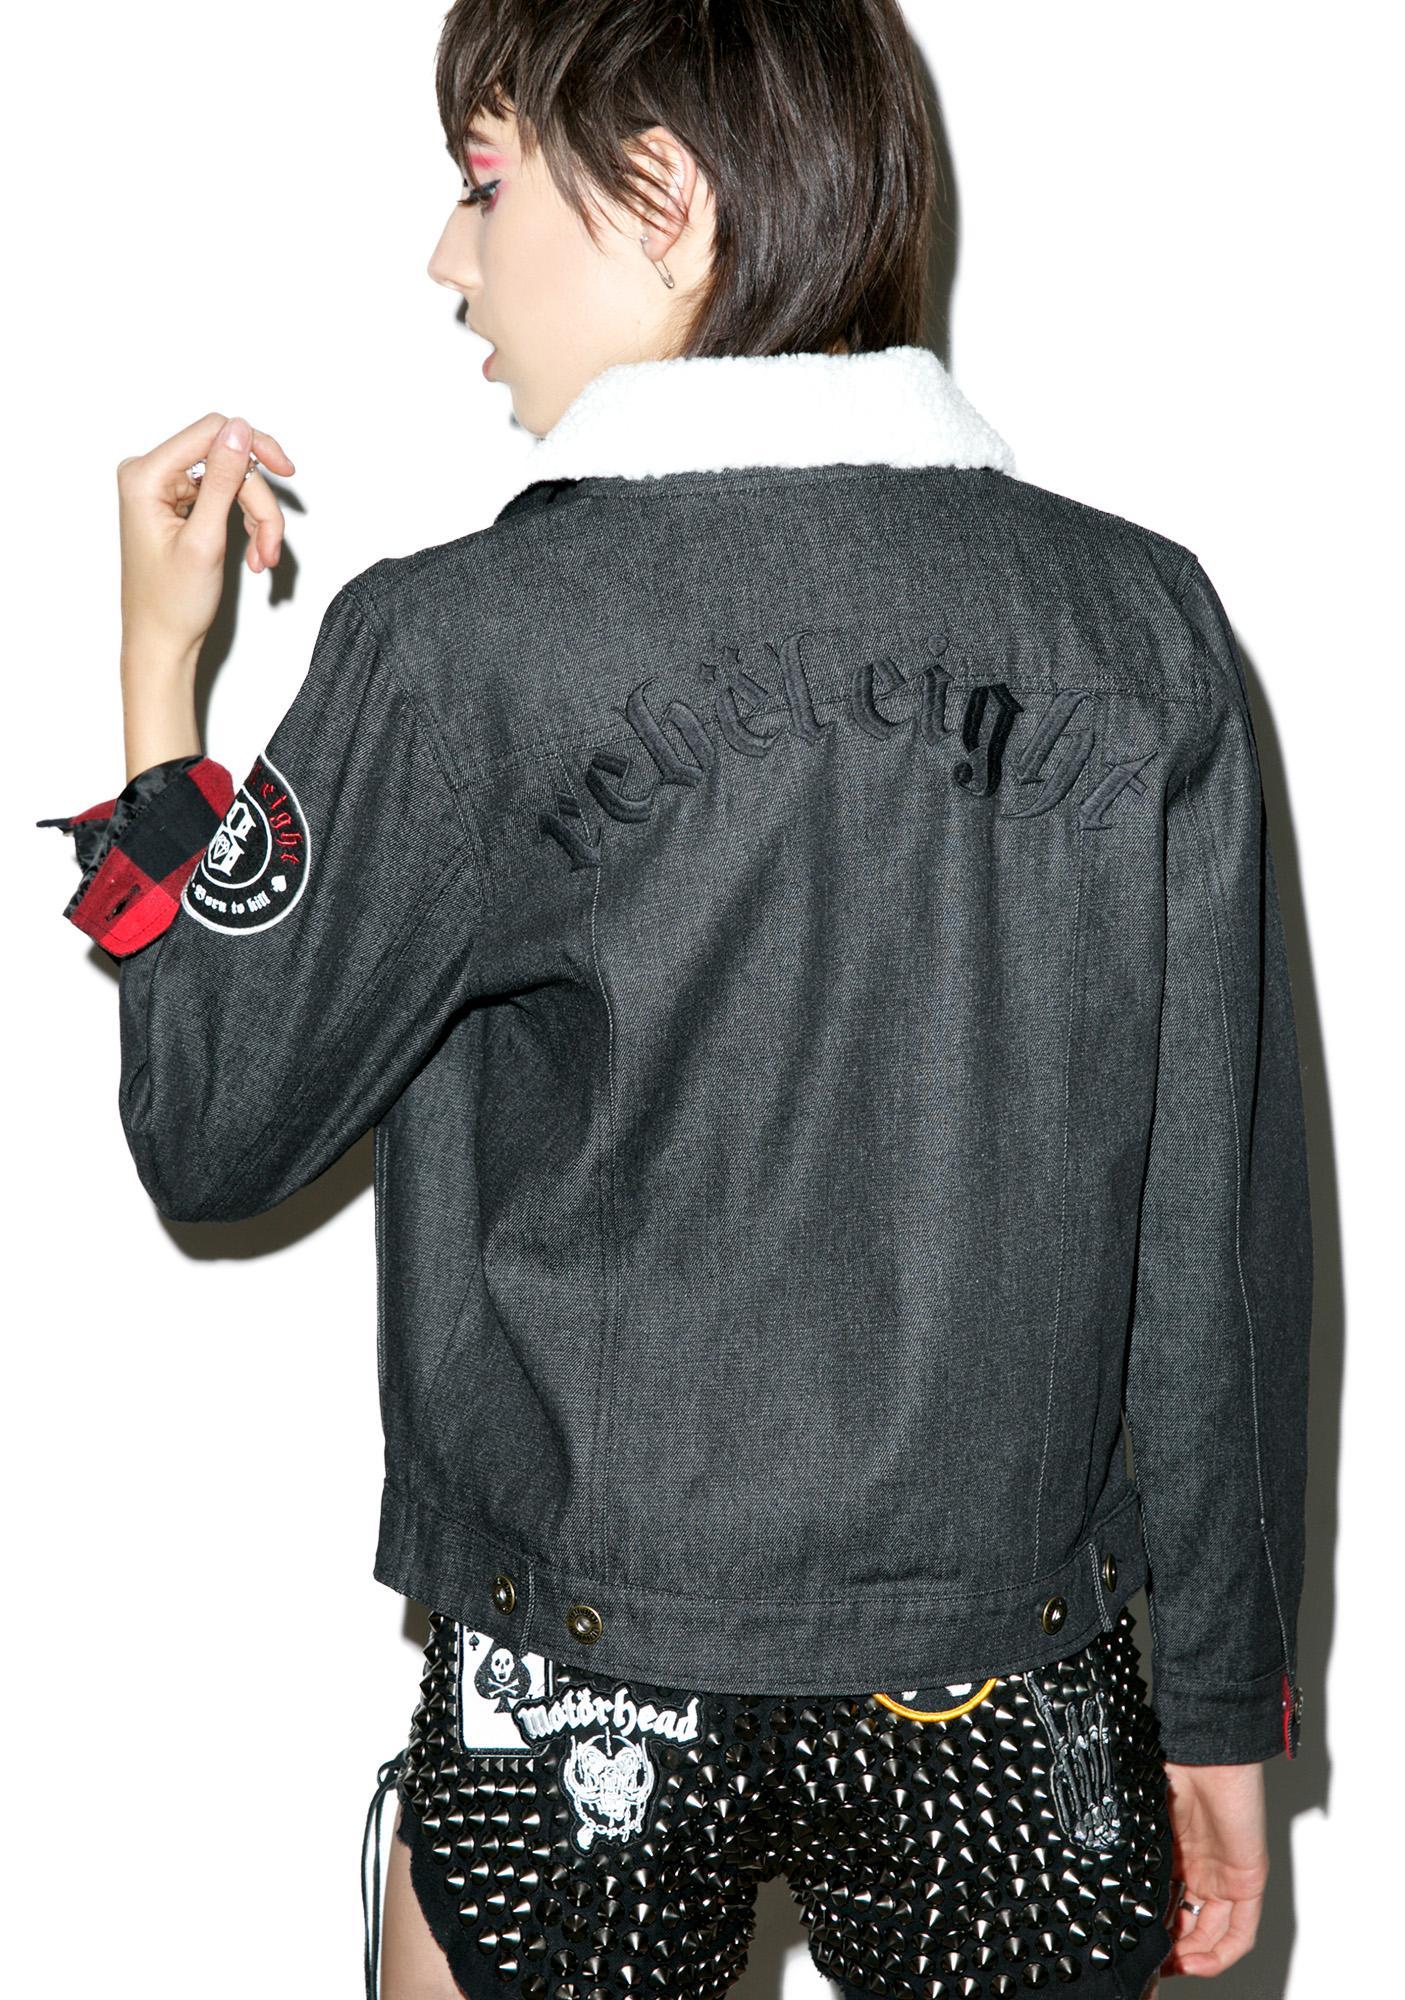 Rebel8 Caution Jacket